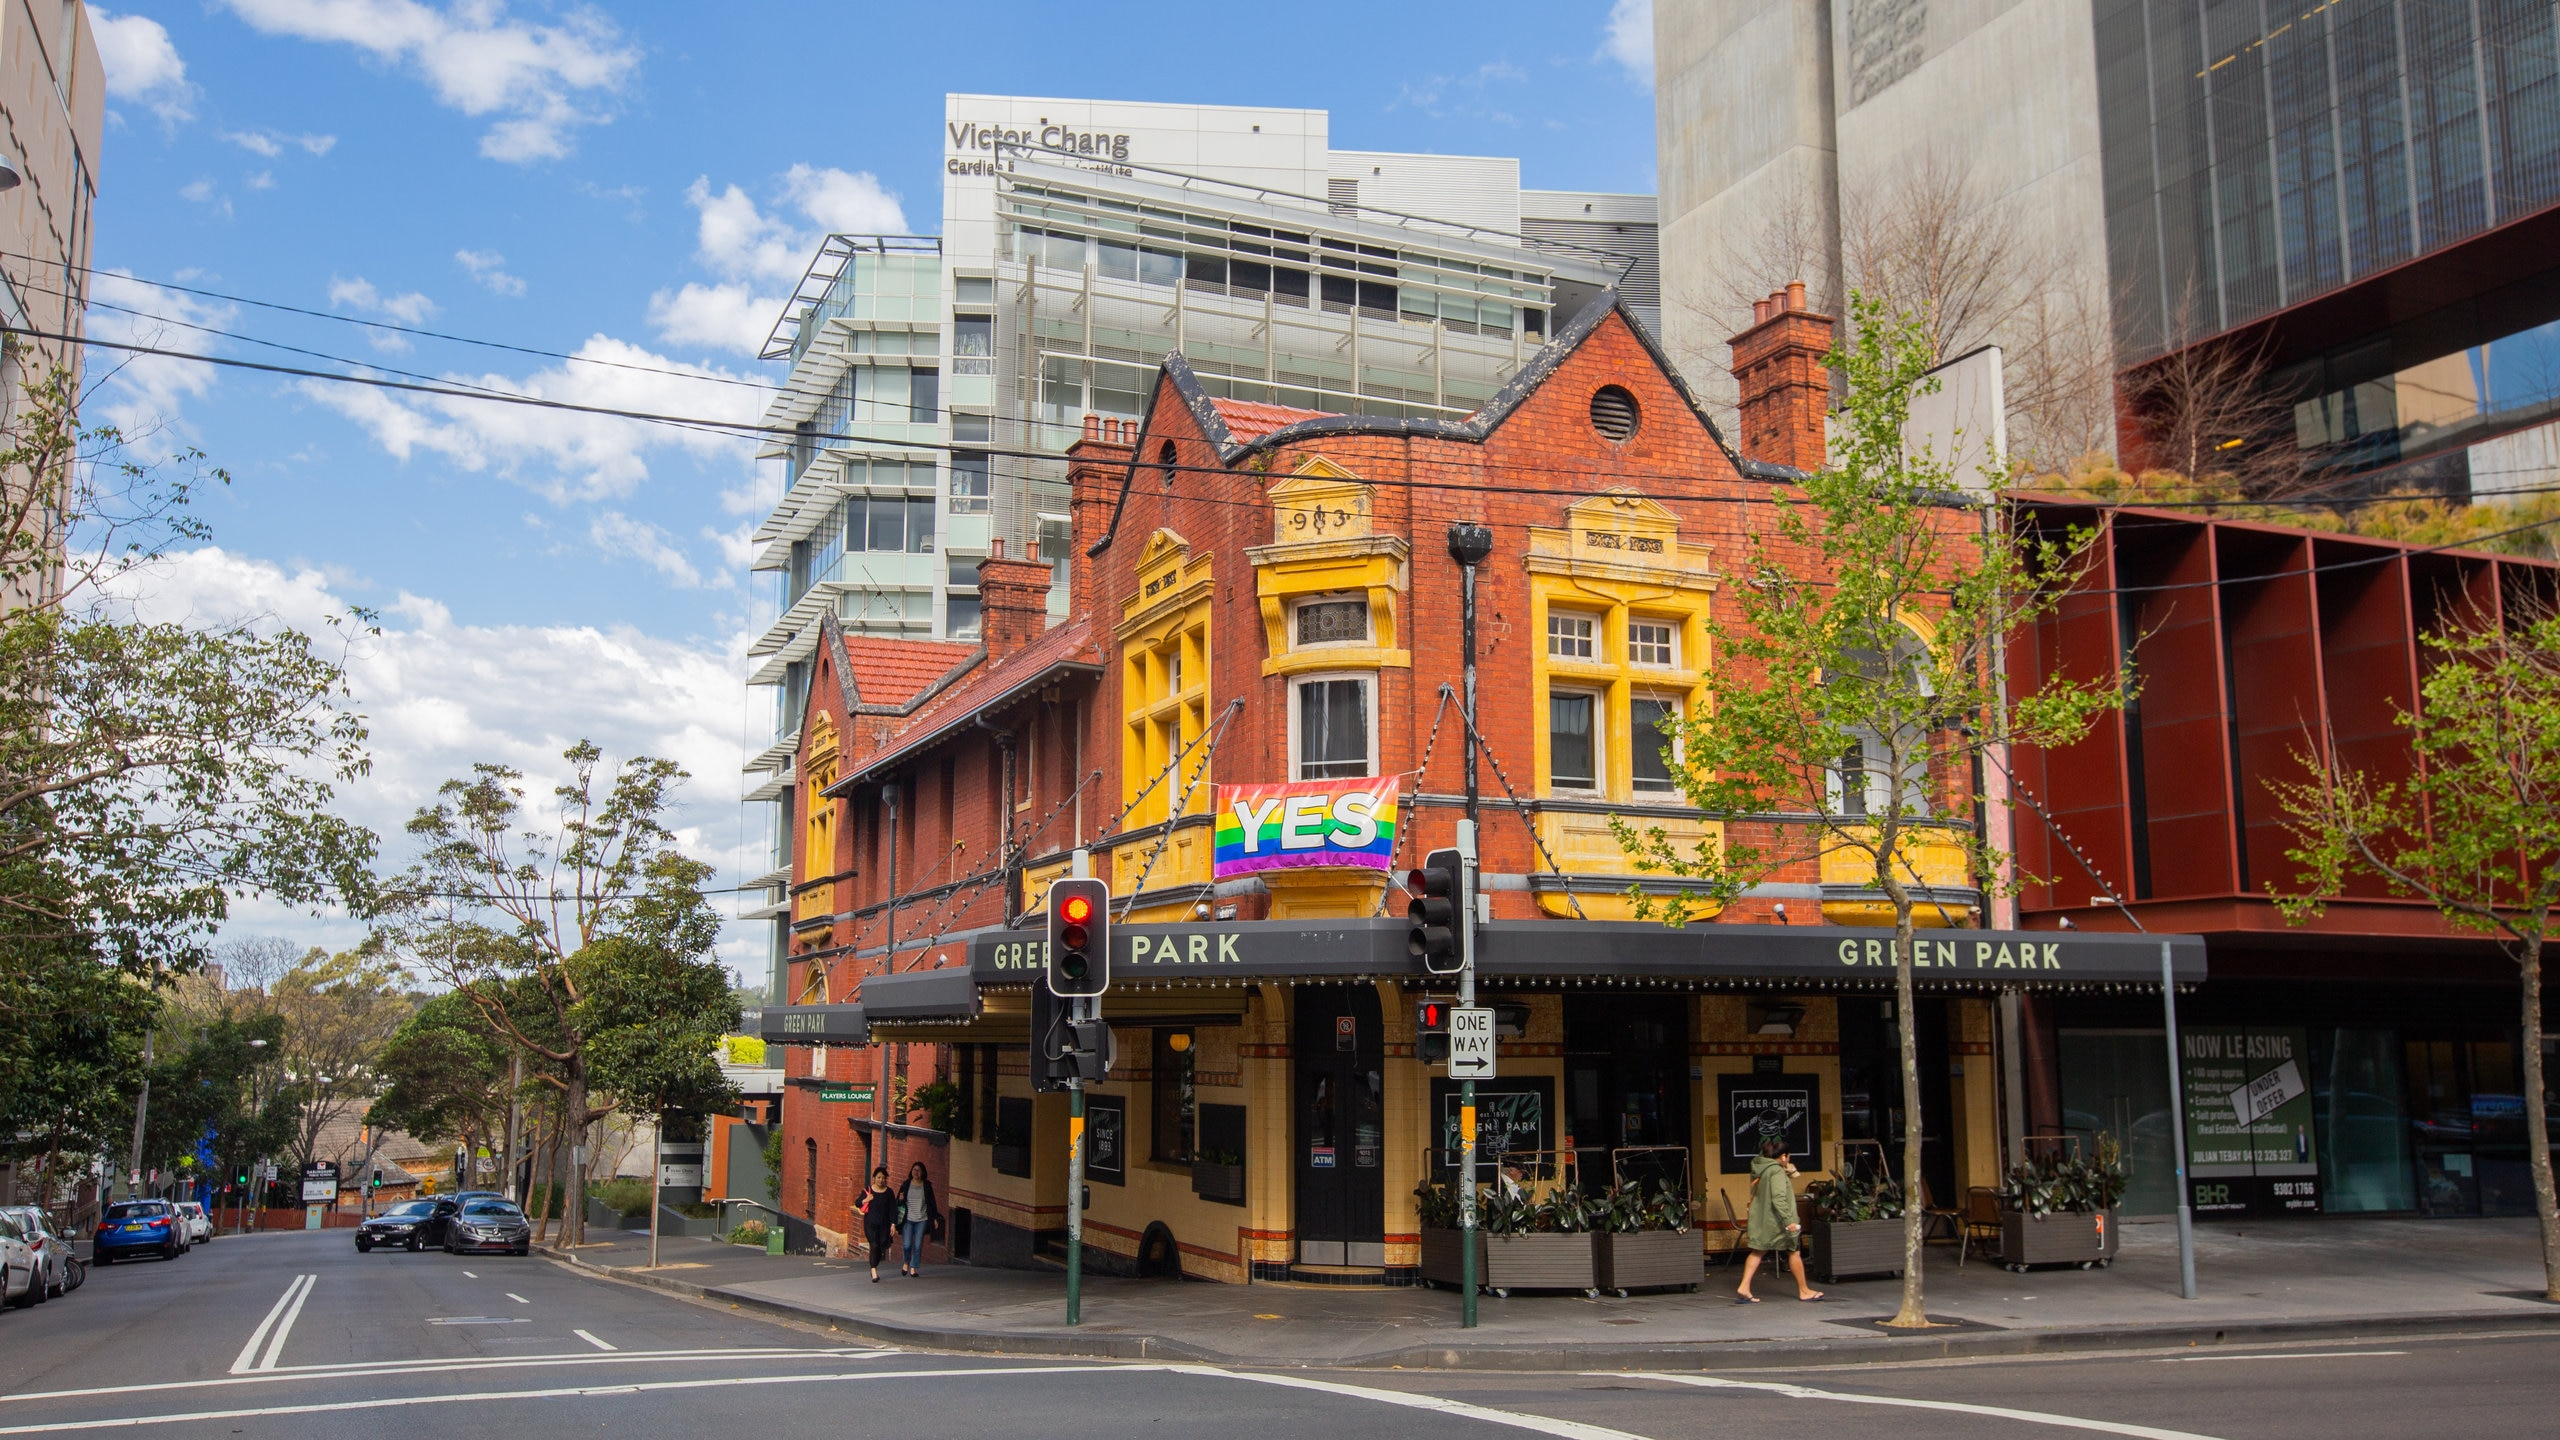 Darlinghurst, Sydney, New South Wales, Australien